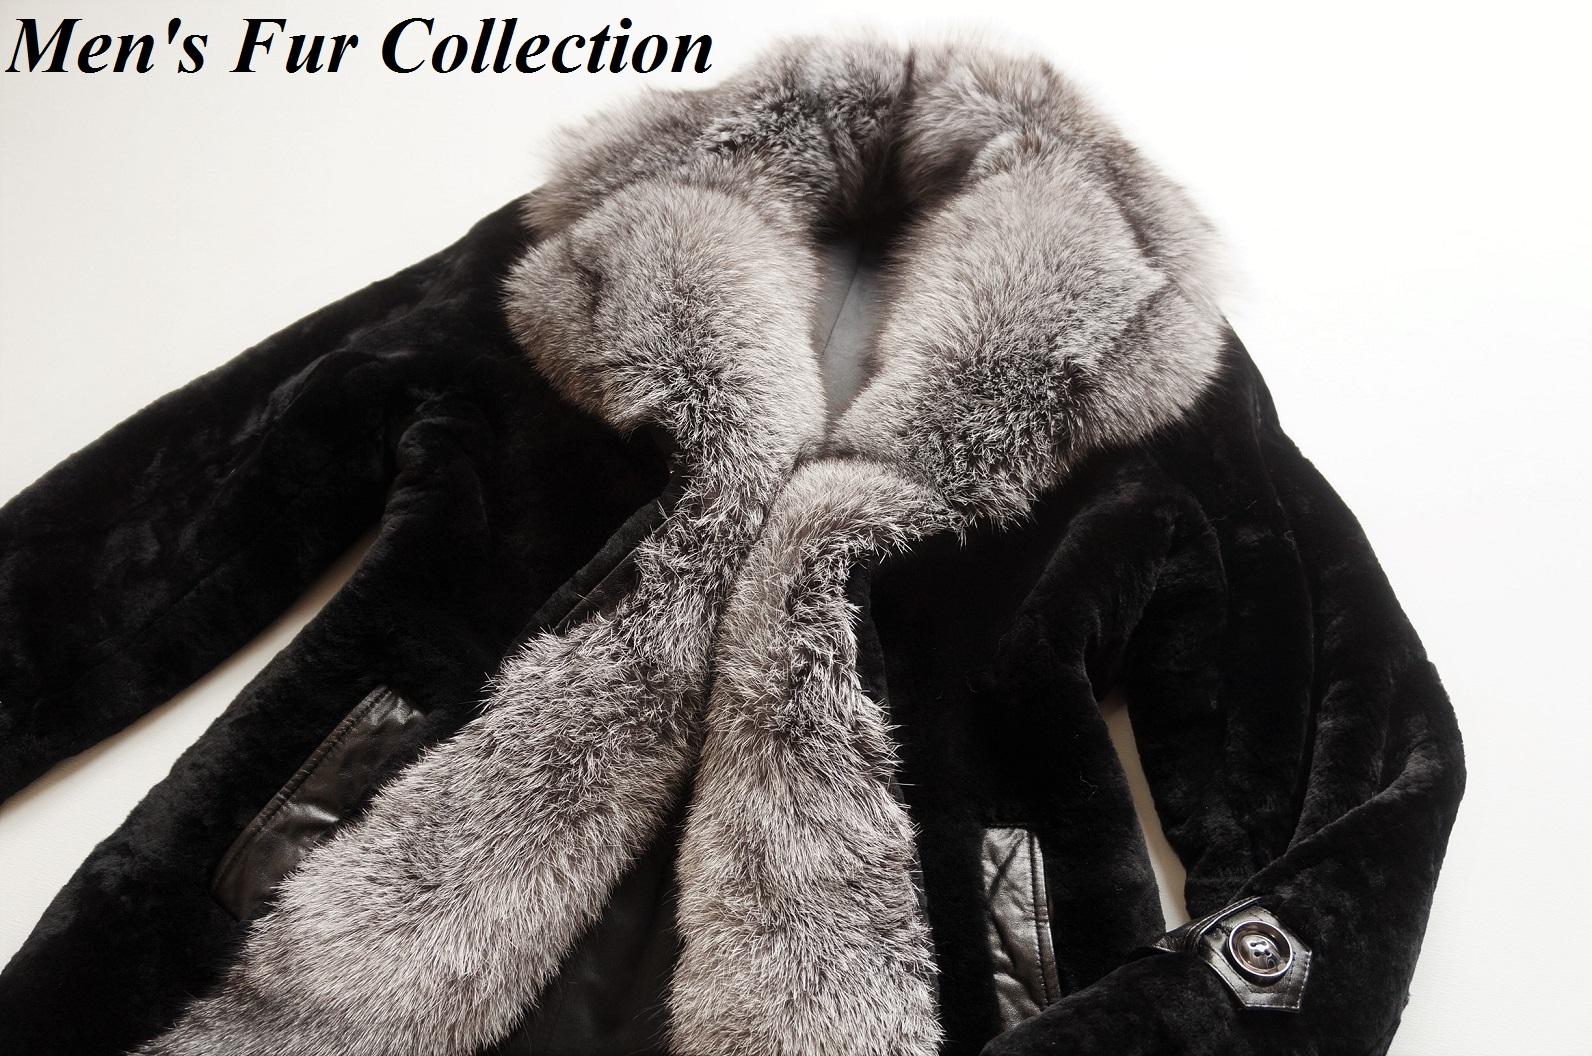 3743b2fa7a5e2 In blue Frost Fox fur X shared lamb mouton fur rial fur coat mouton coat  men ● crocodile crocodile / Armani / Gucci / Loewe / ブリオーニ / chrome Hertz /  ...